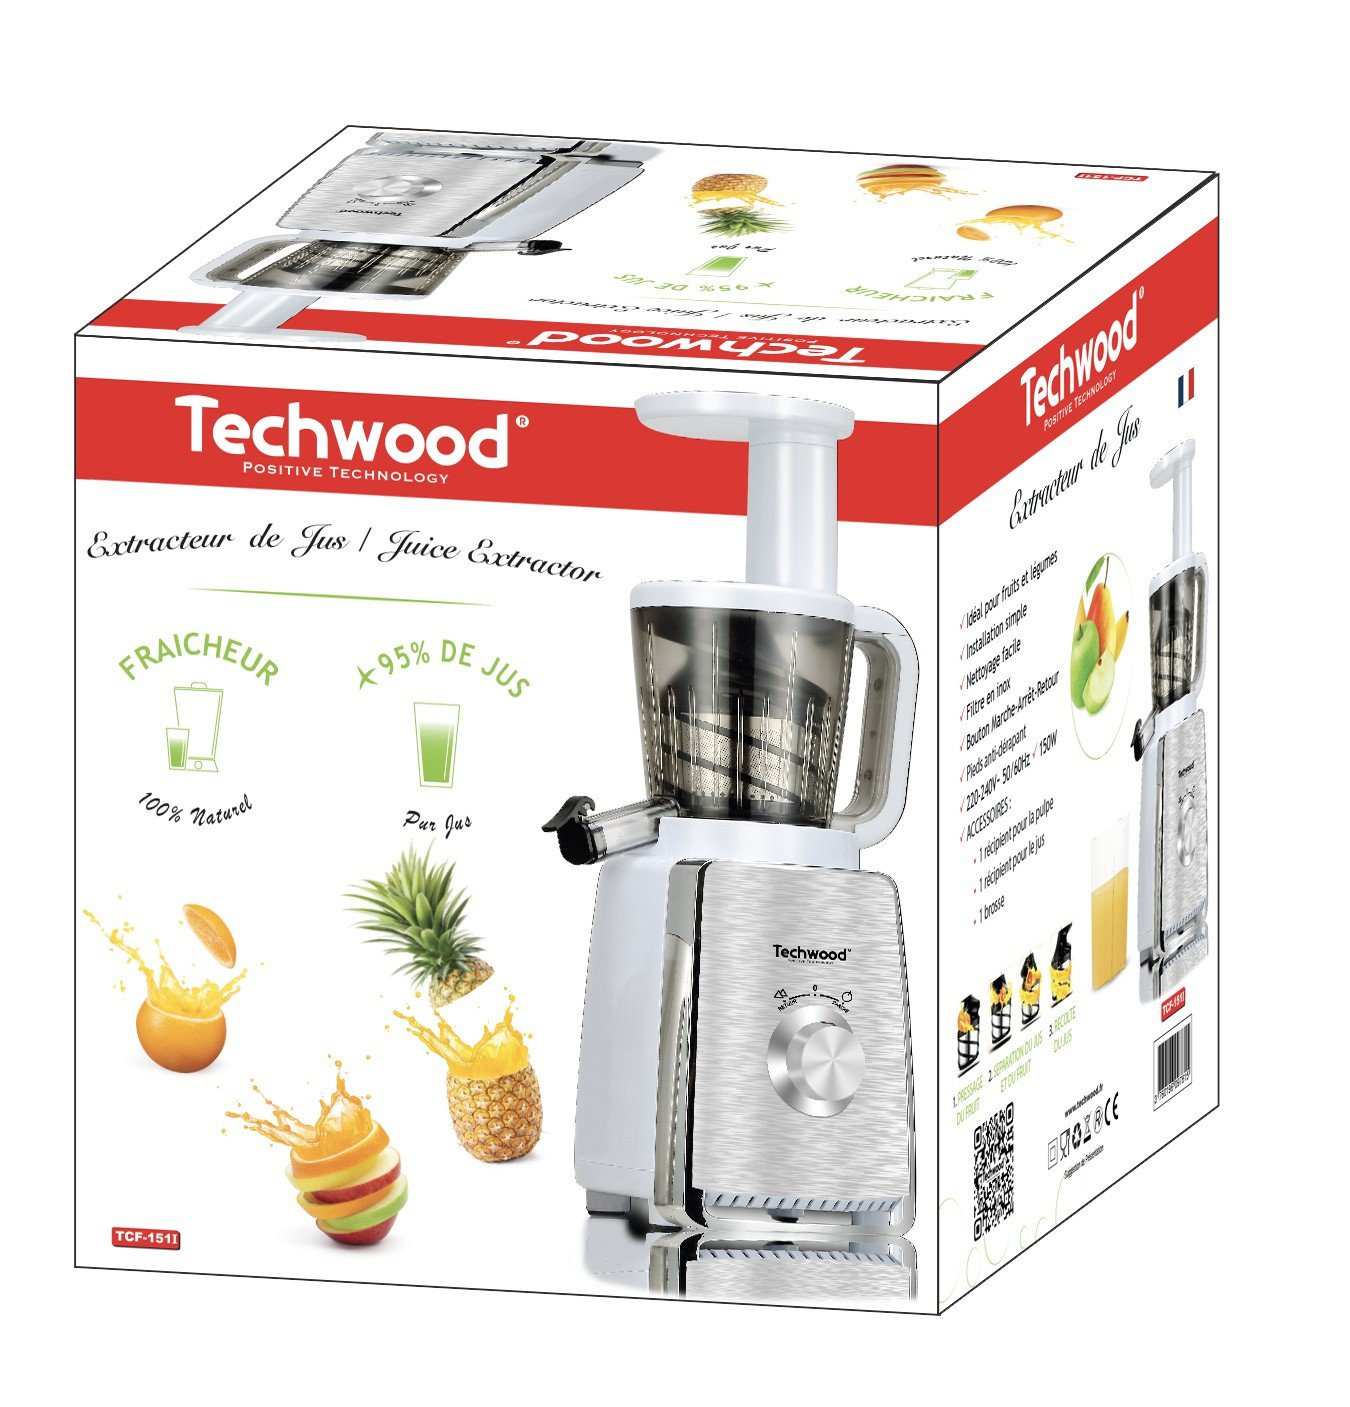 Techwood extractor de zumo: Amazon.es: Hogar